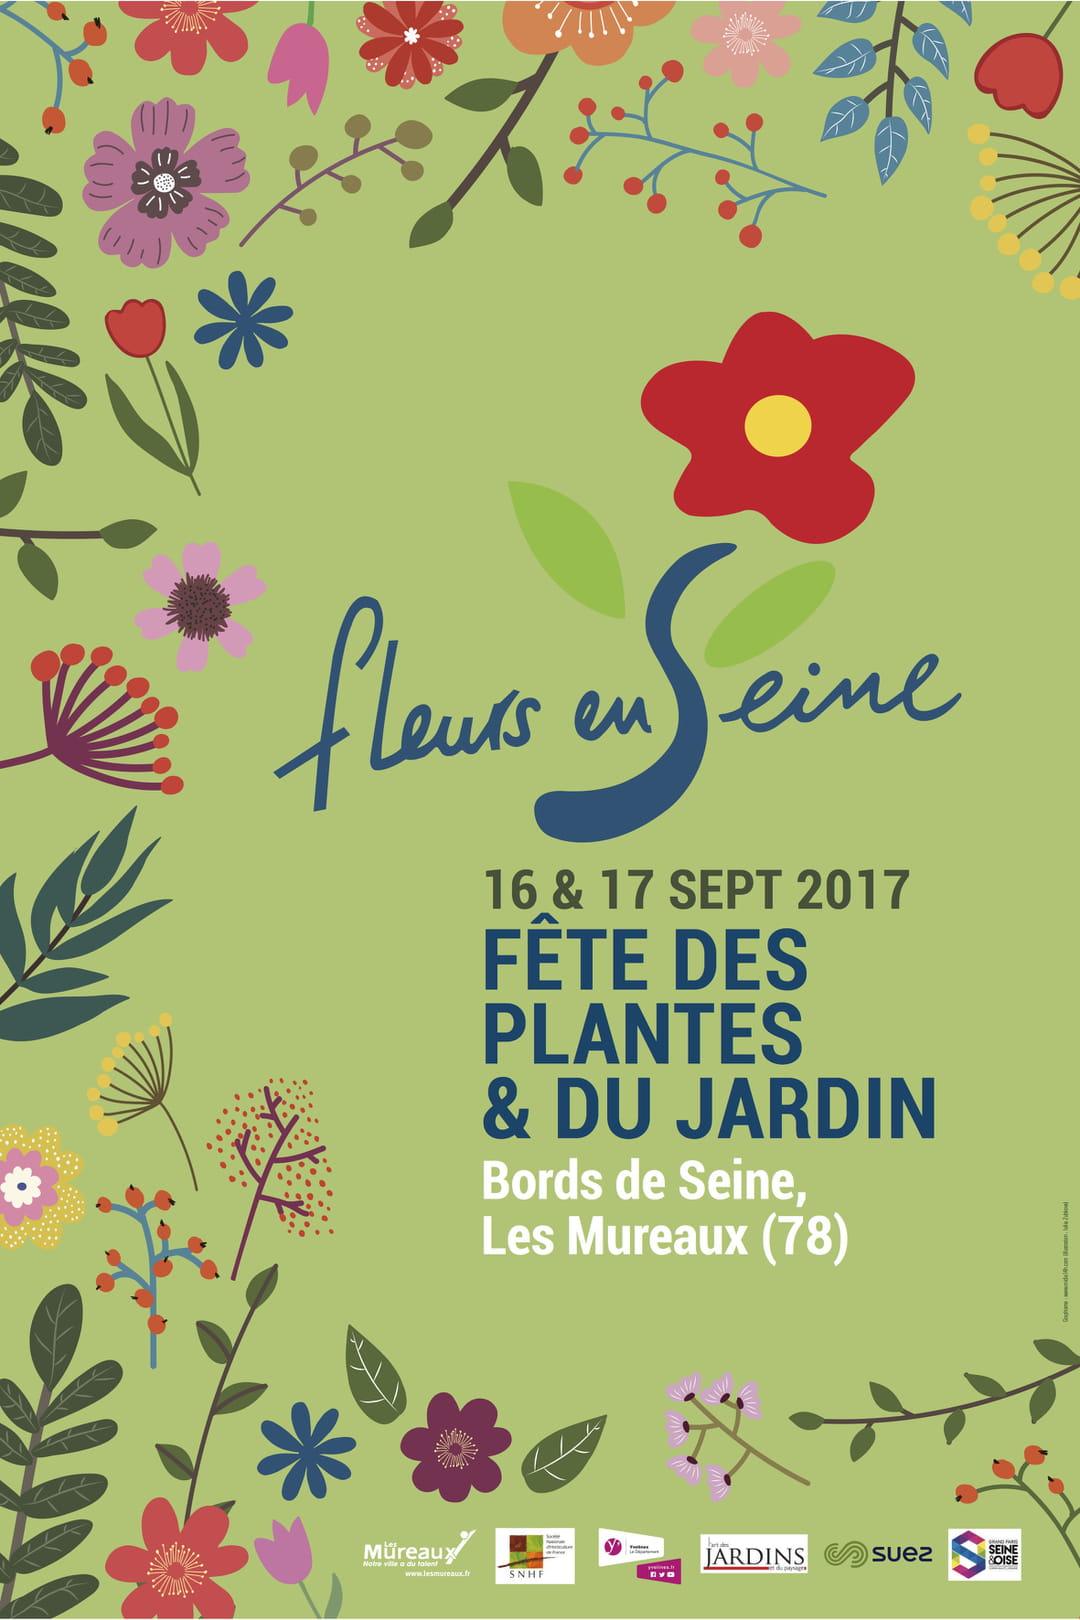 affiche-14-edition-fleurs-en-seine